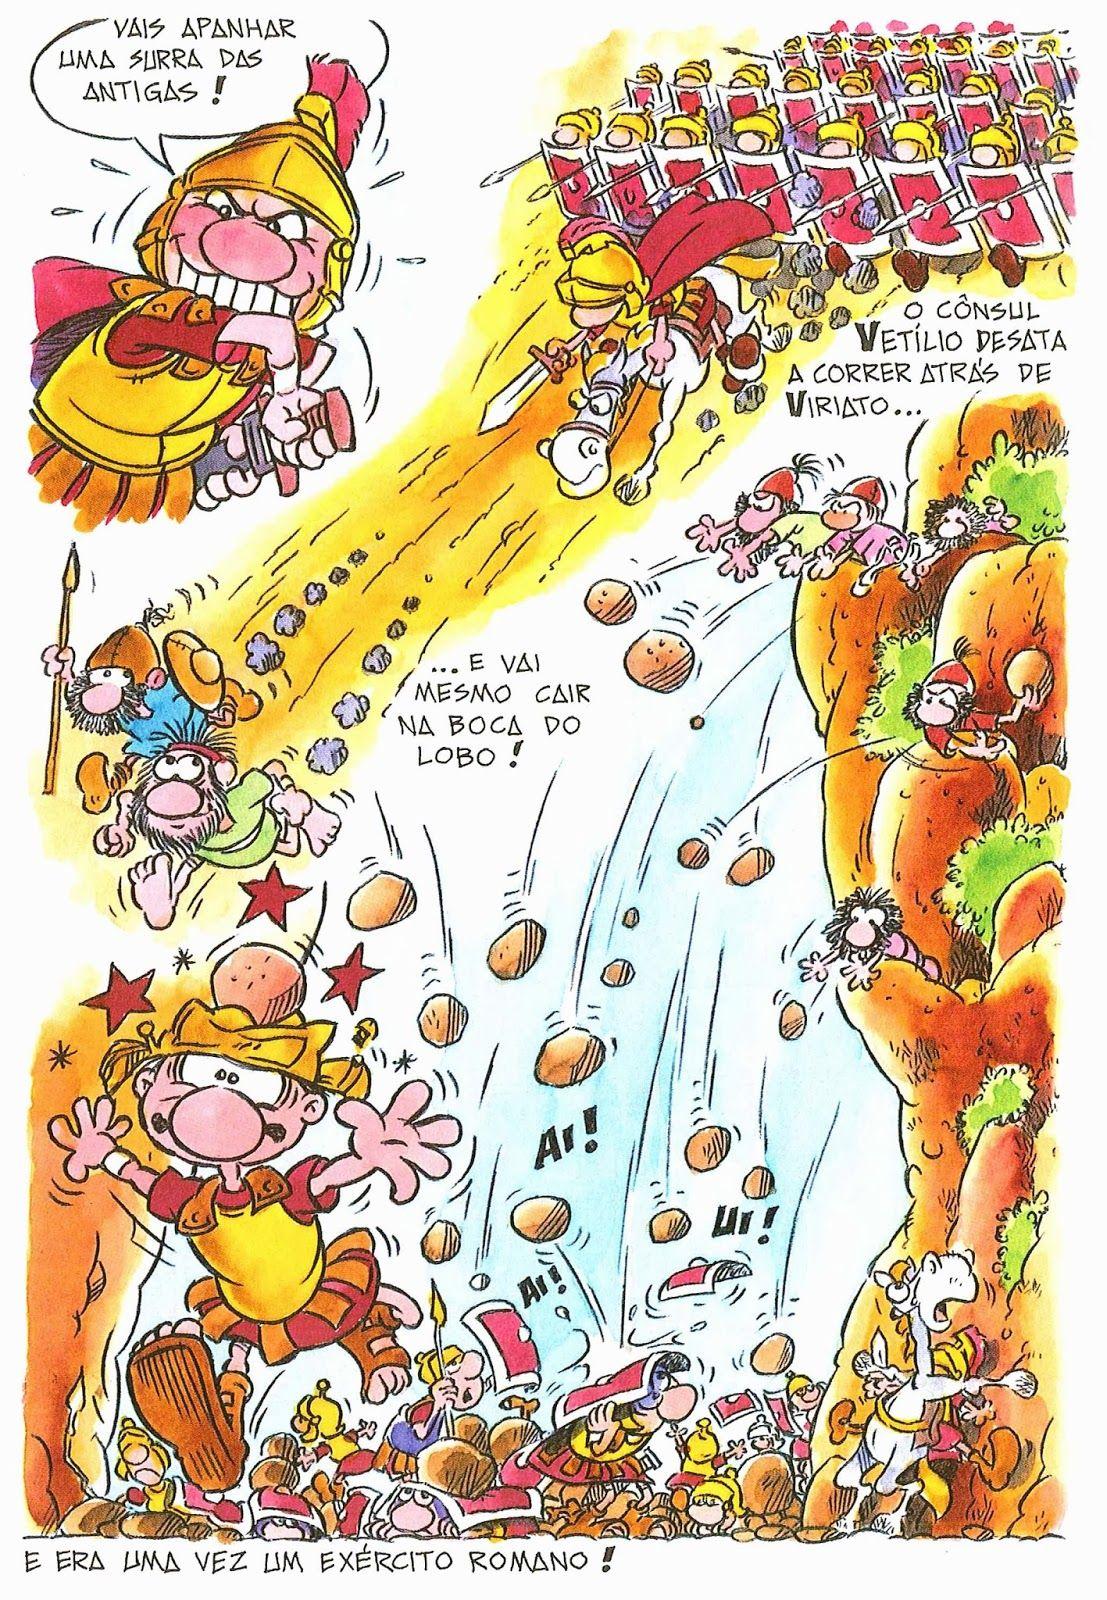 BDBD - Blogue De Banda Desenhada: BD E HISTÓRIA DE PORTUGAL (5) - VIRIATO